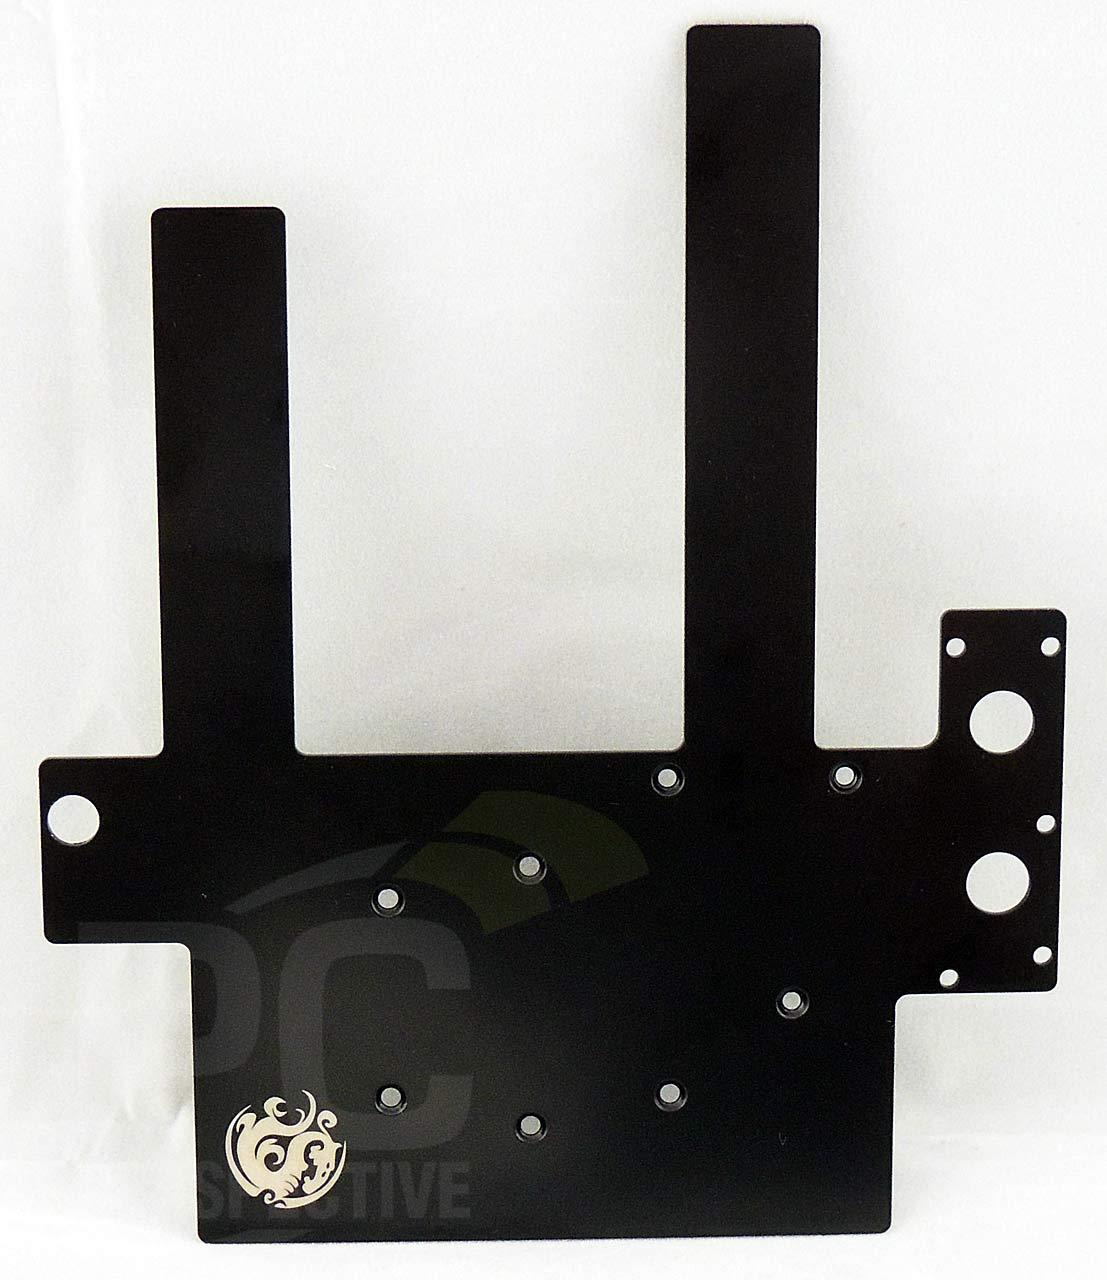 05-chipset-block-topplate-top.jpg